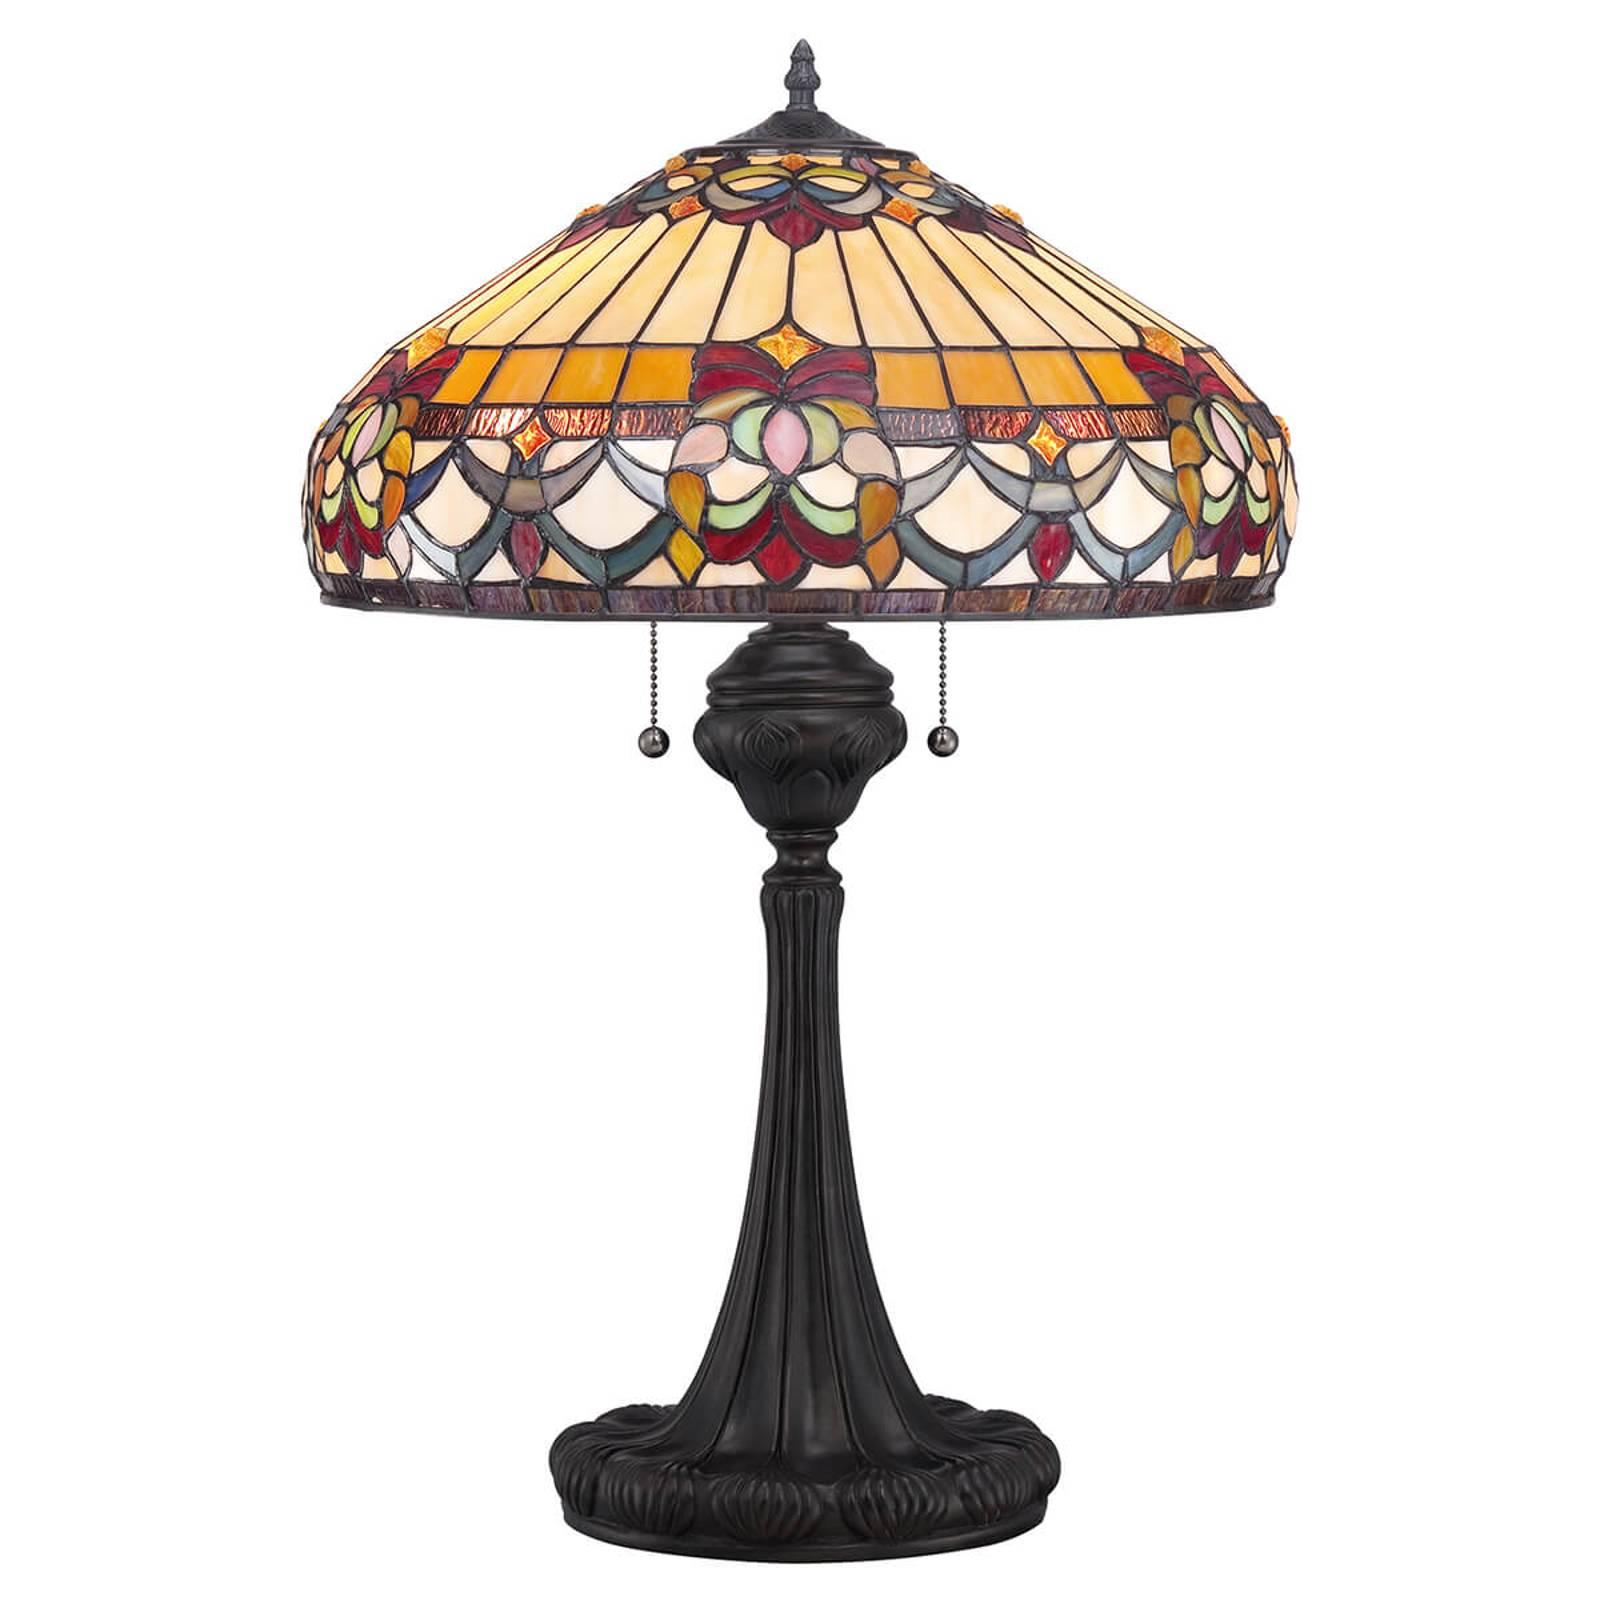 Tafellamp Belle Fleur in Tiffany-design